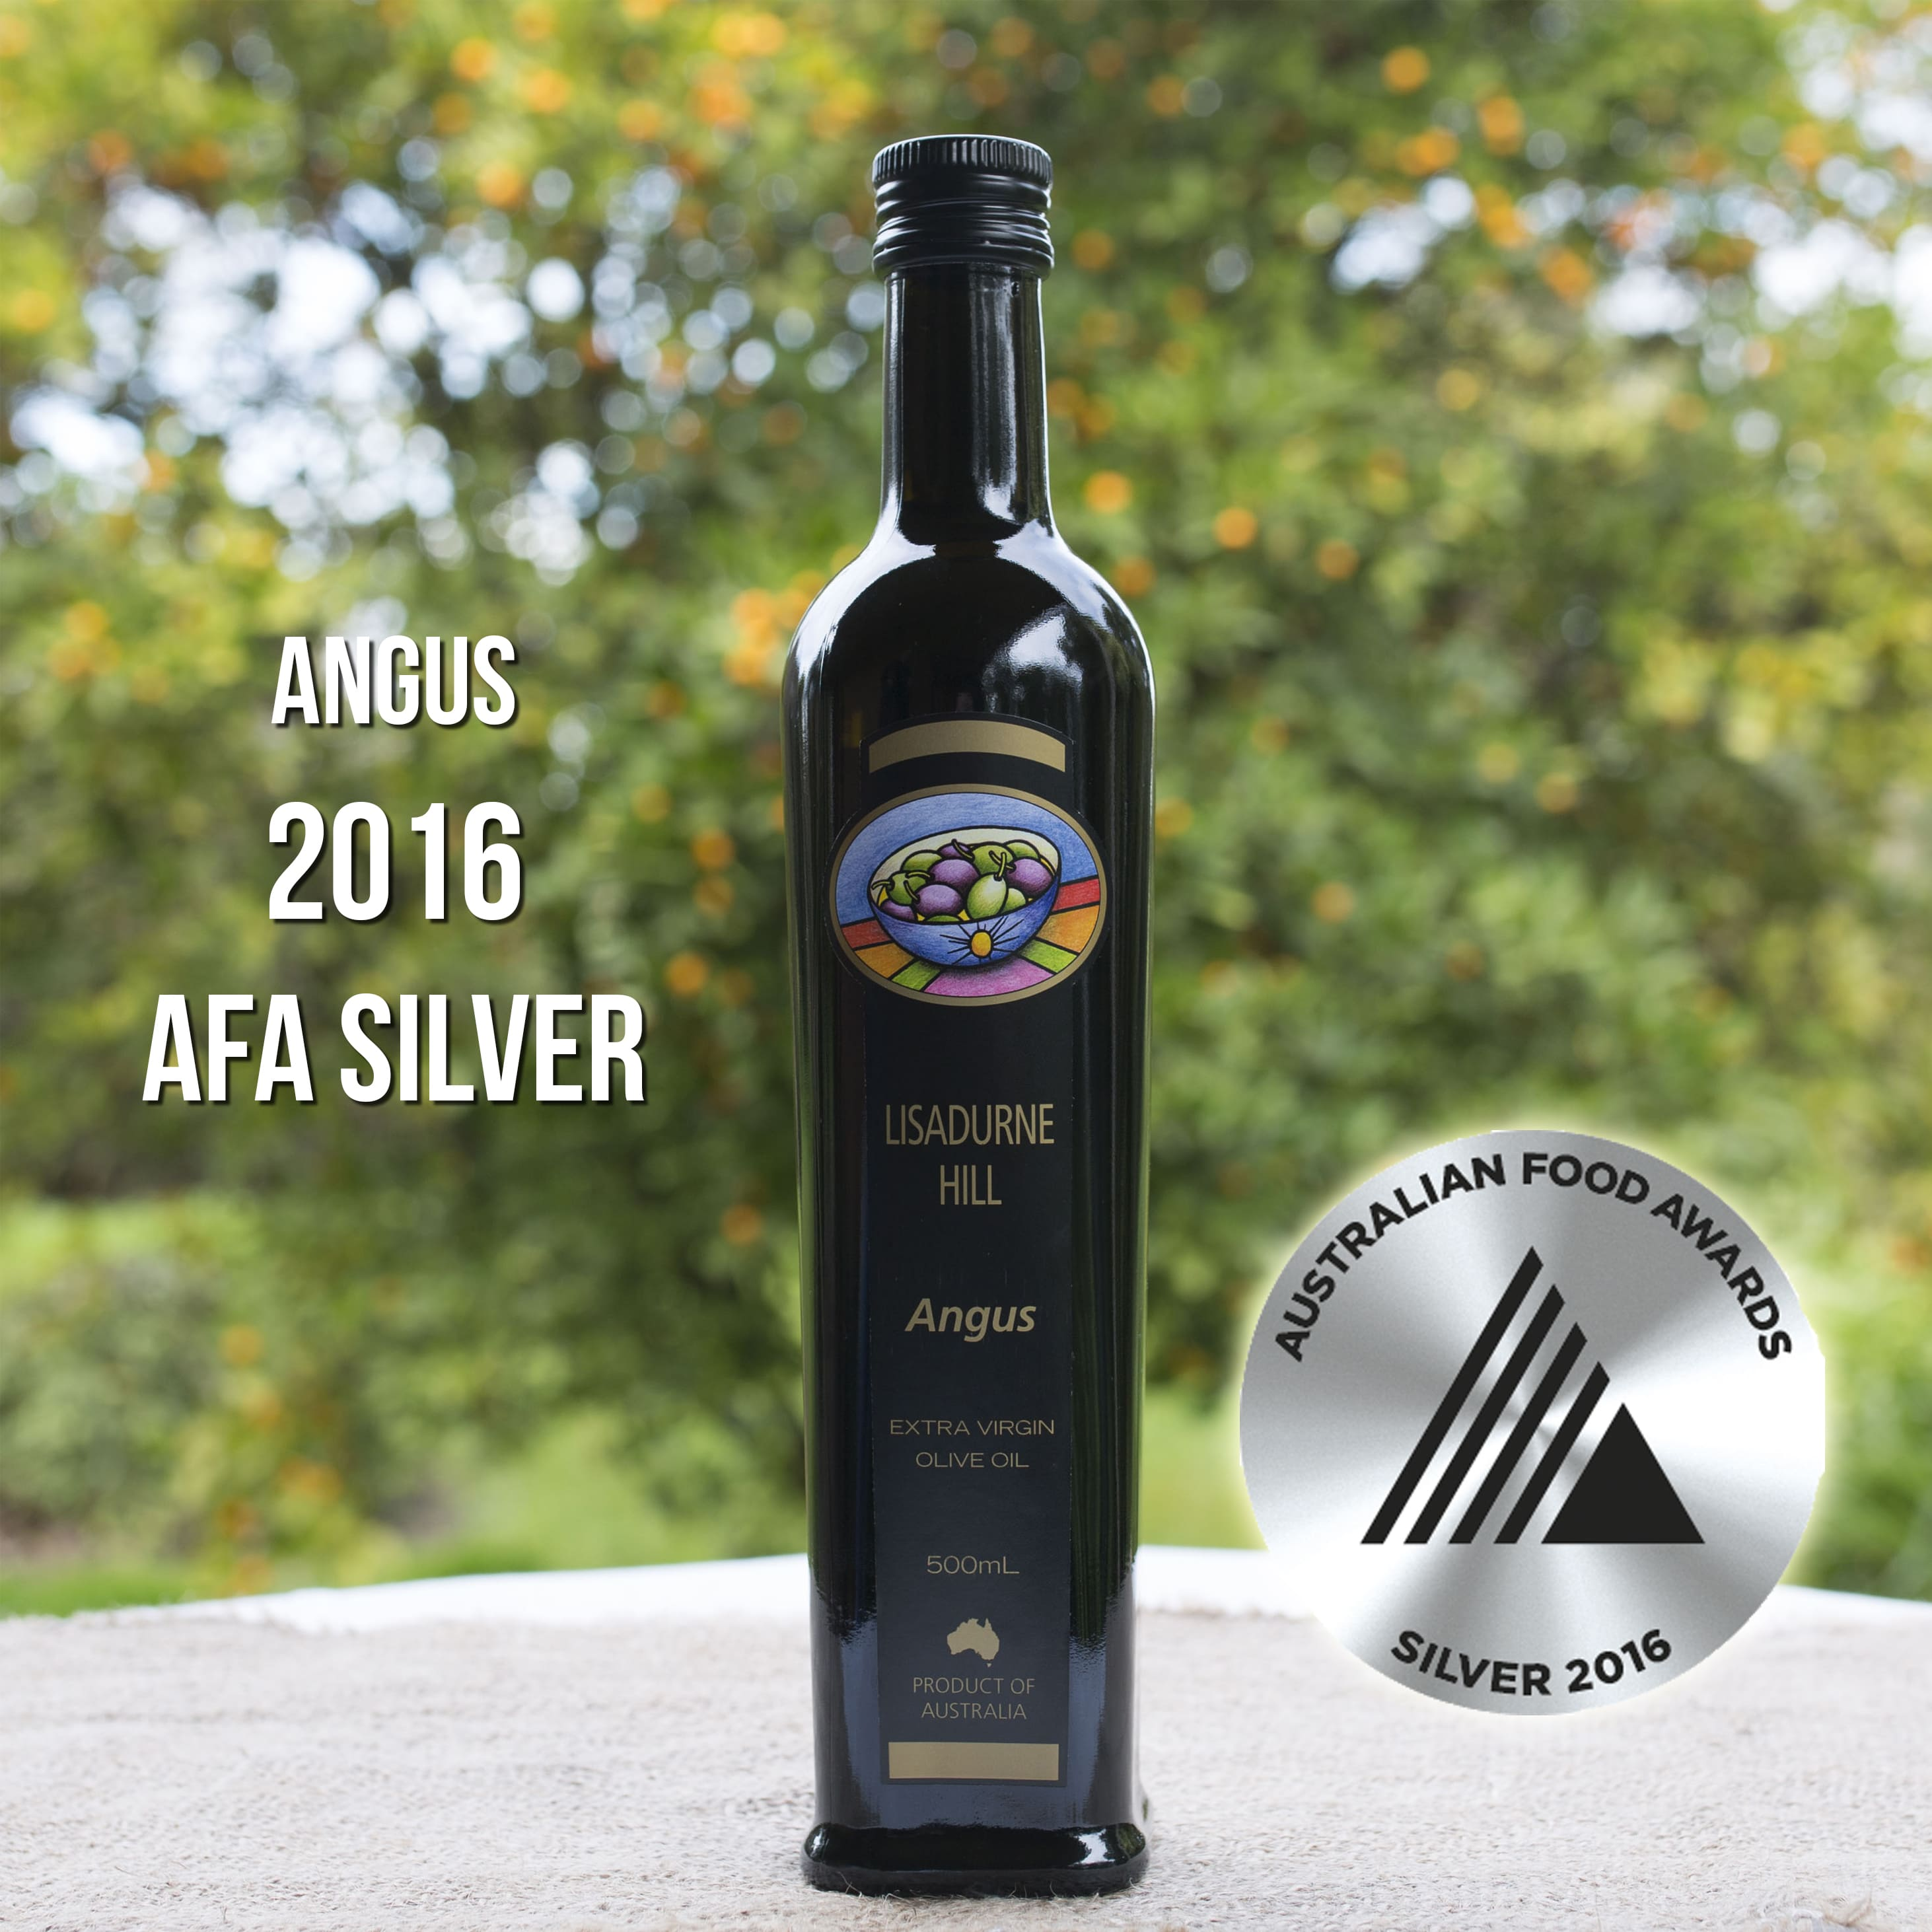 2016 xngus award - Copy-min